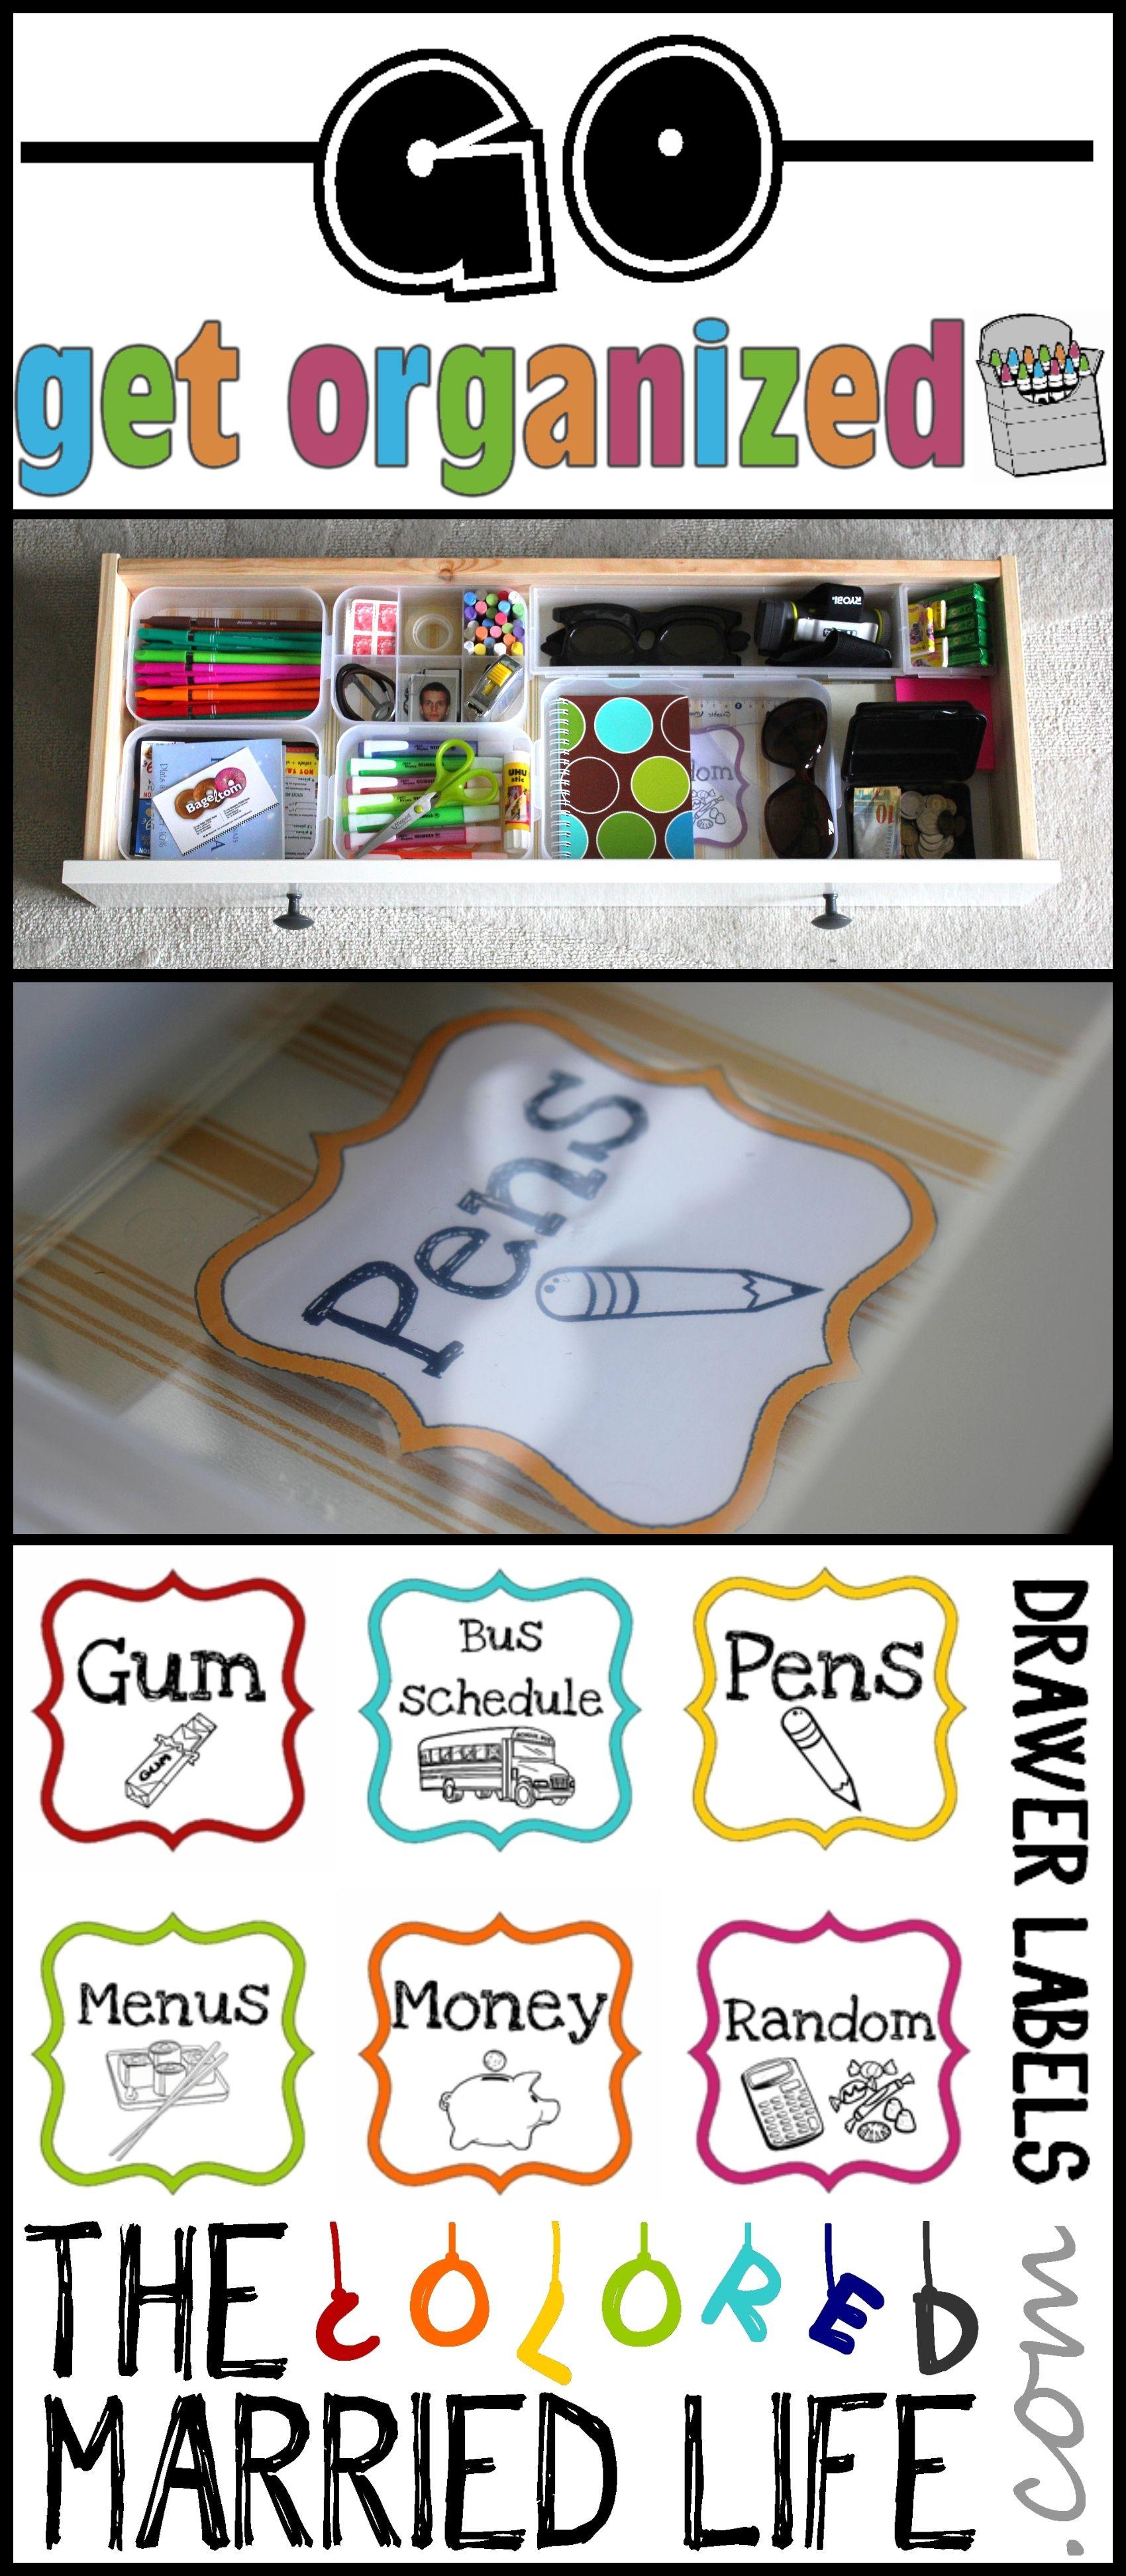 Drawer Labels Useful For Kids Free Printable Ecoloredmarriedlife